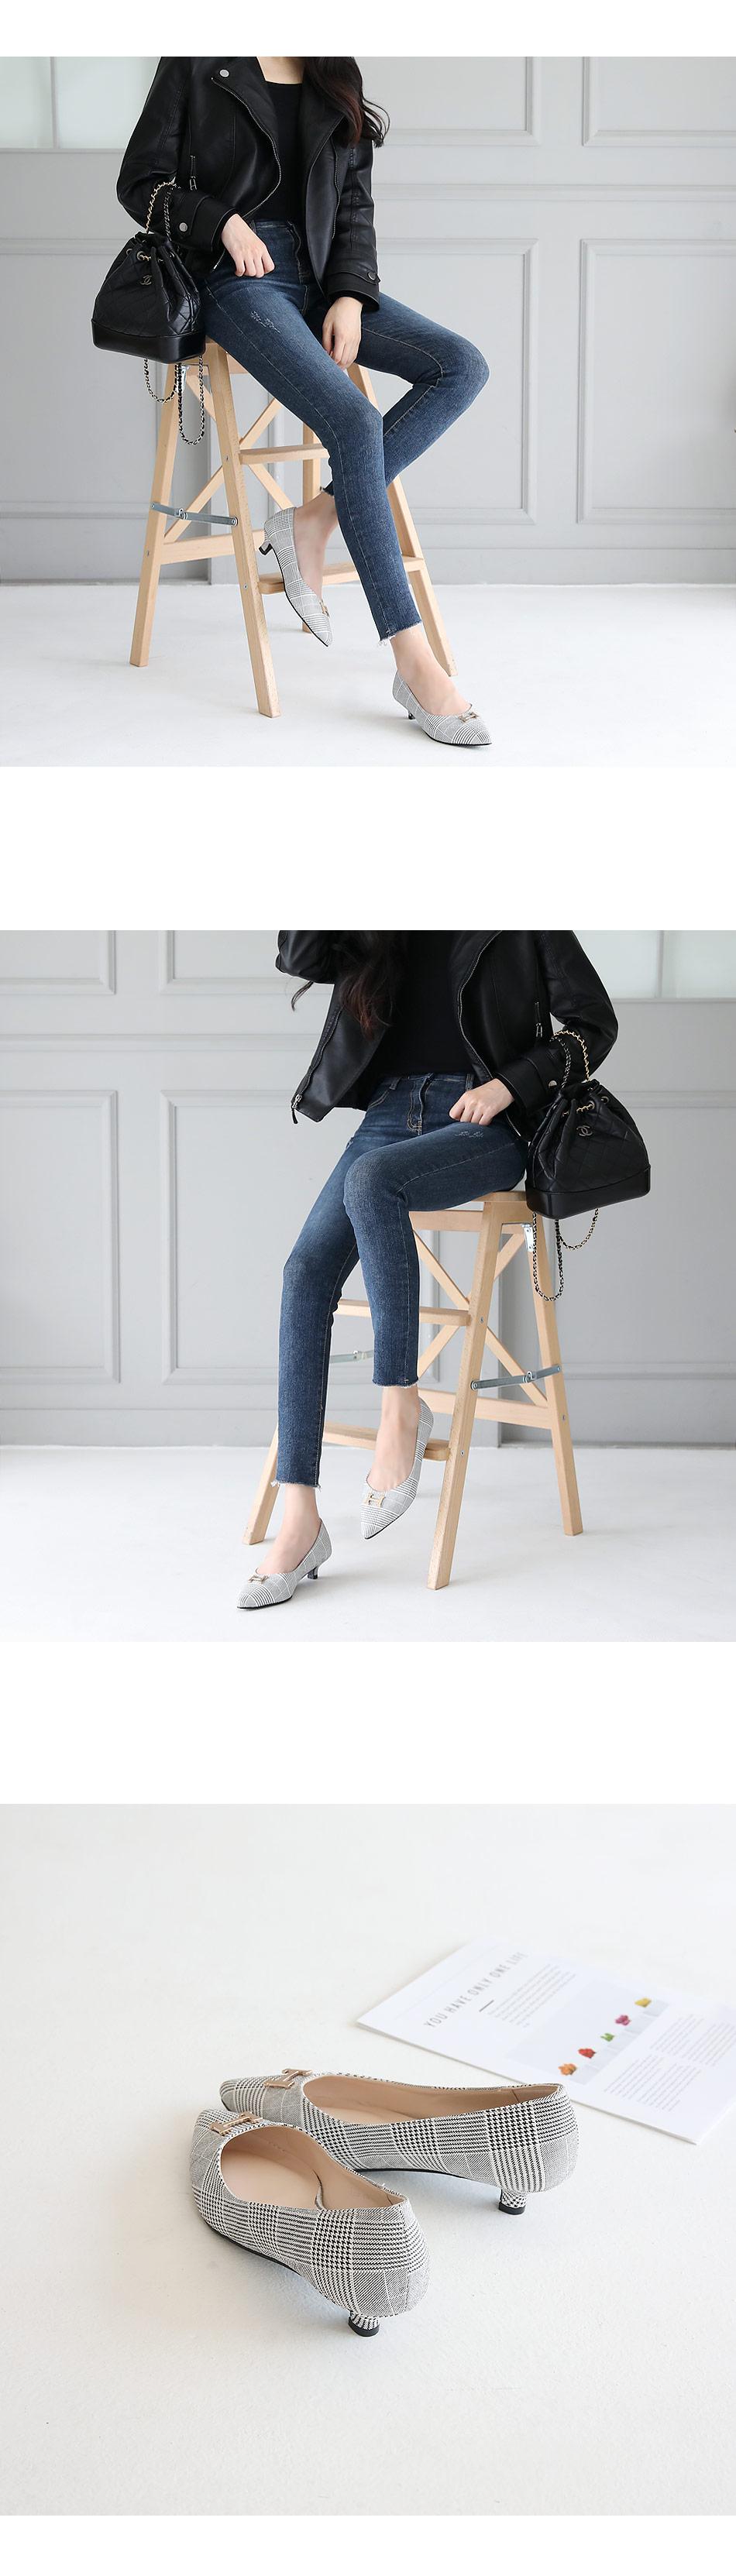 Elean Flat Shoes 3cm